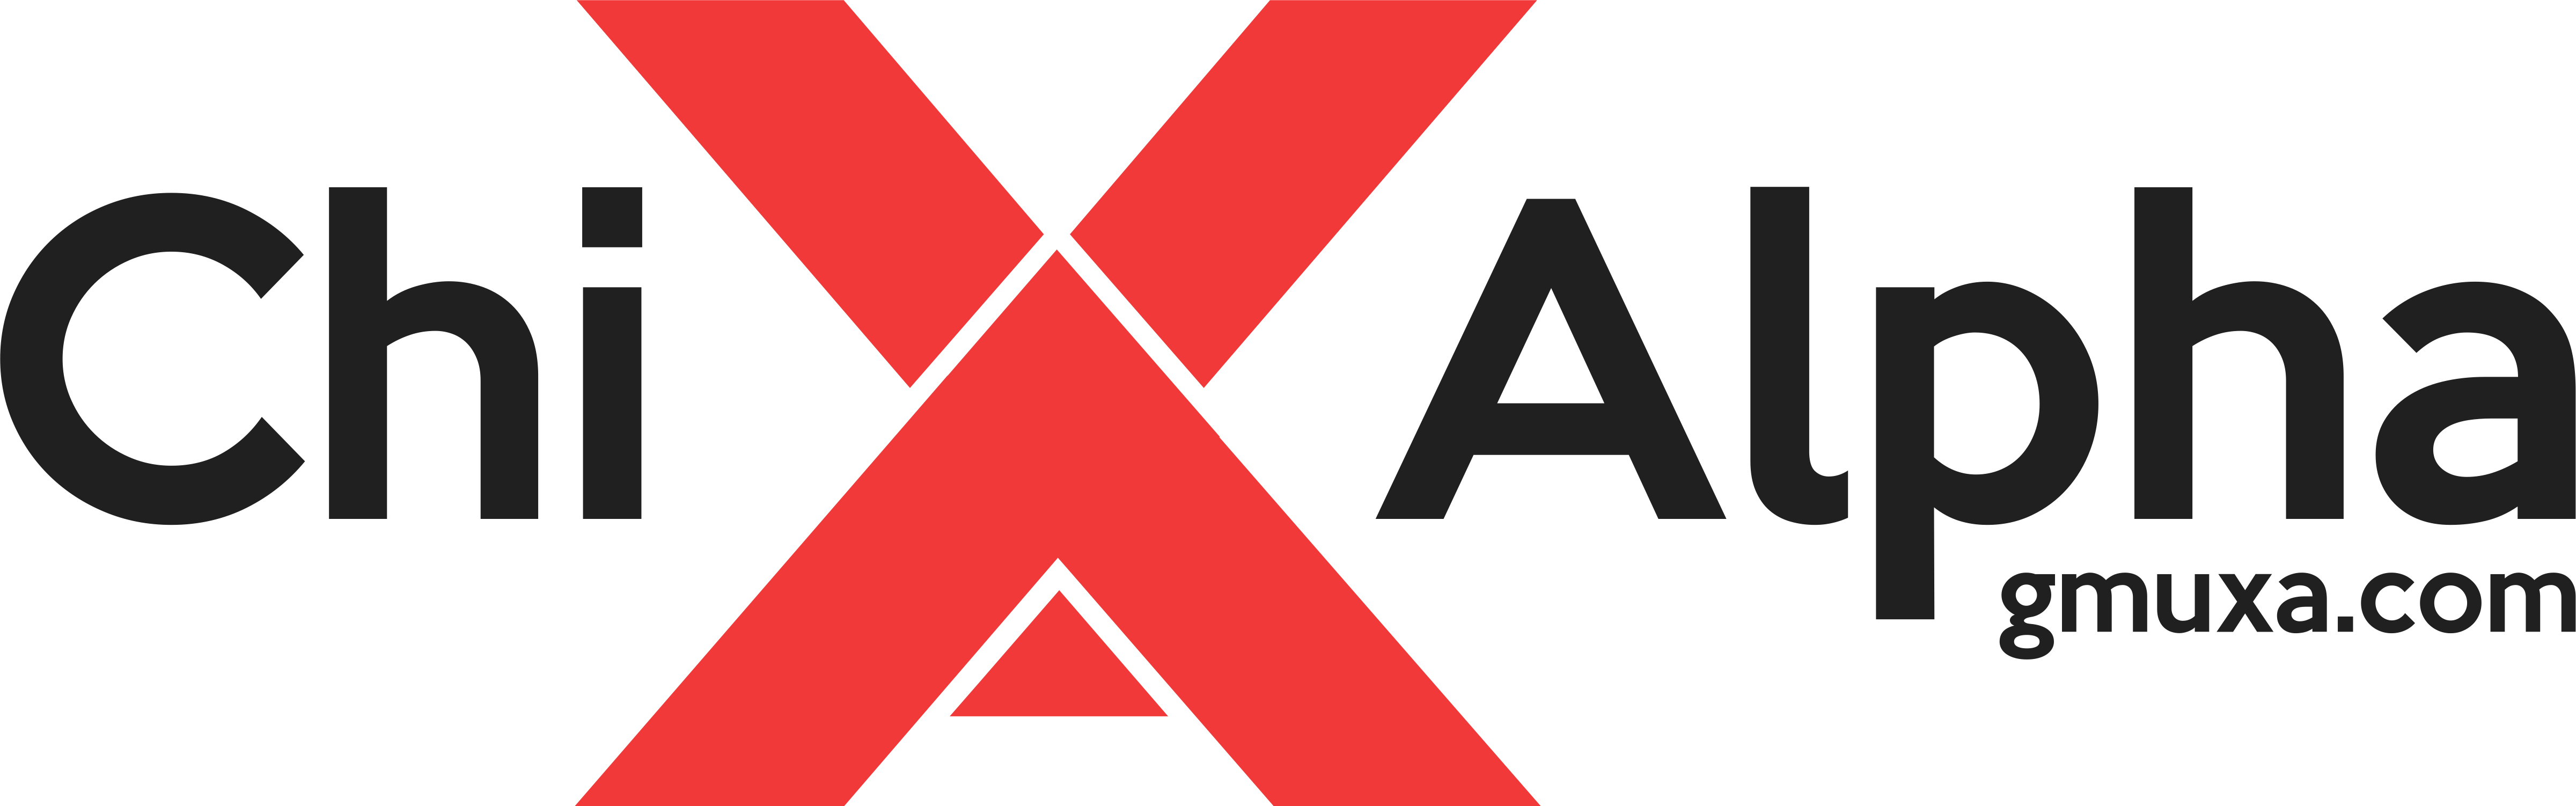 Chi alpha life logo  2.jpg